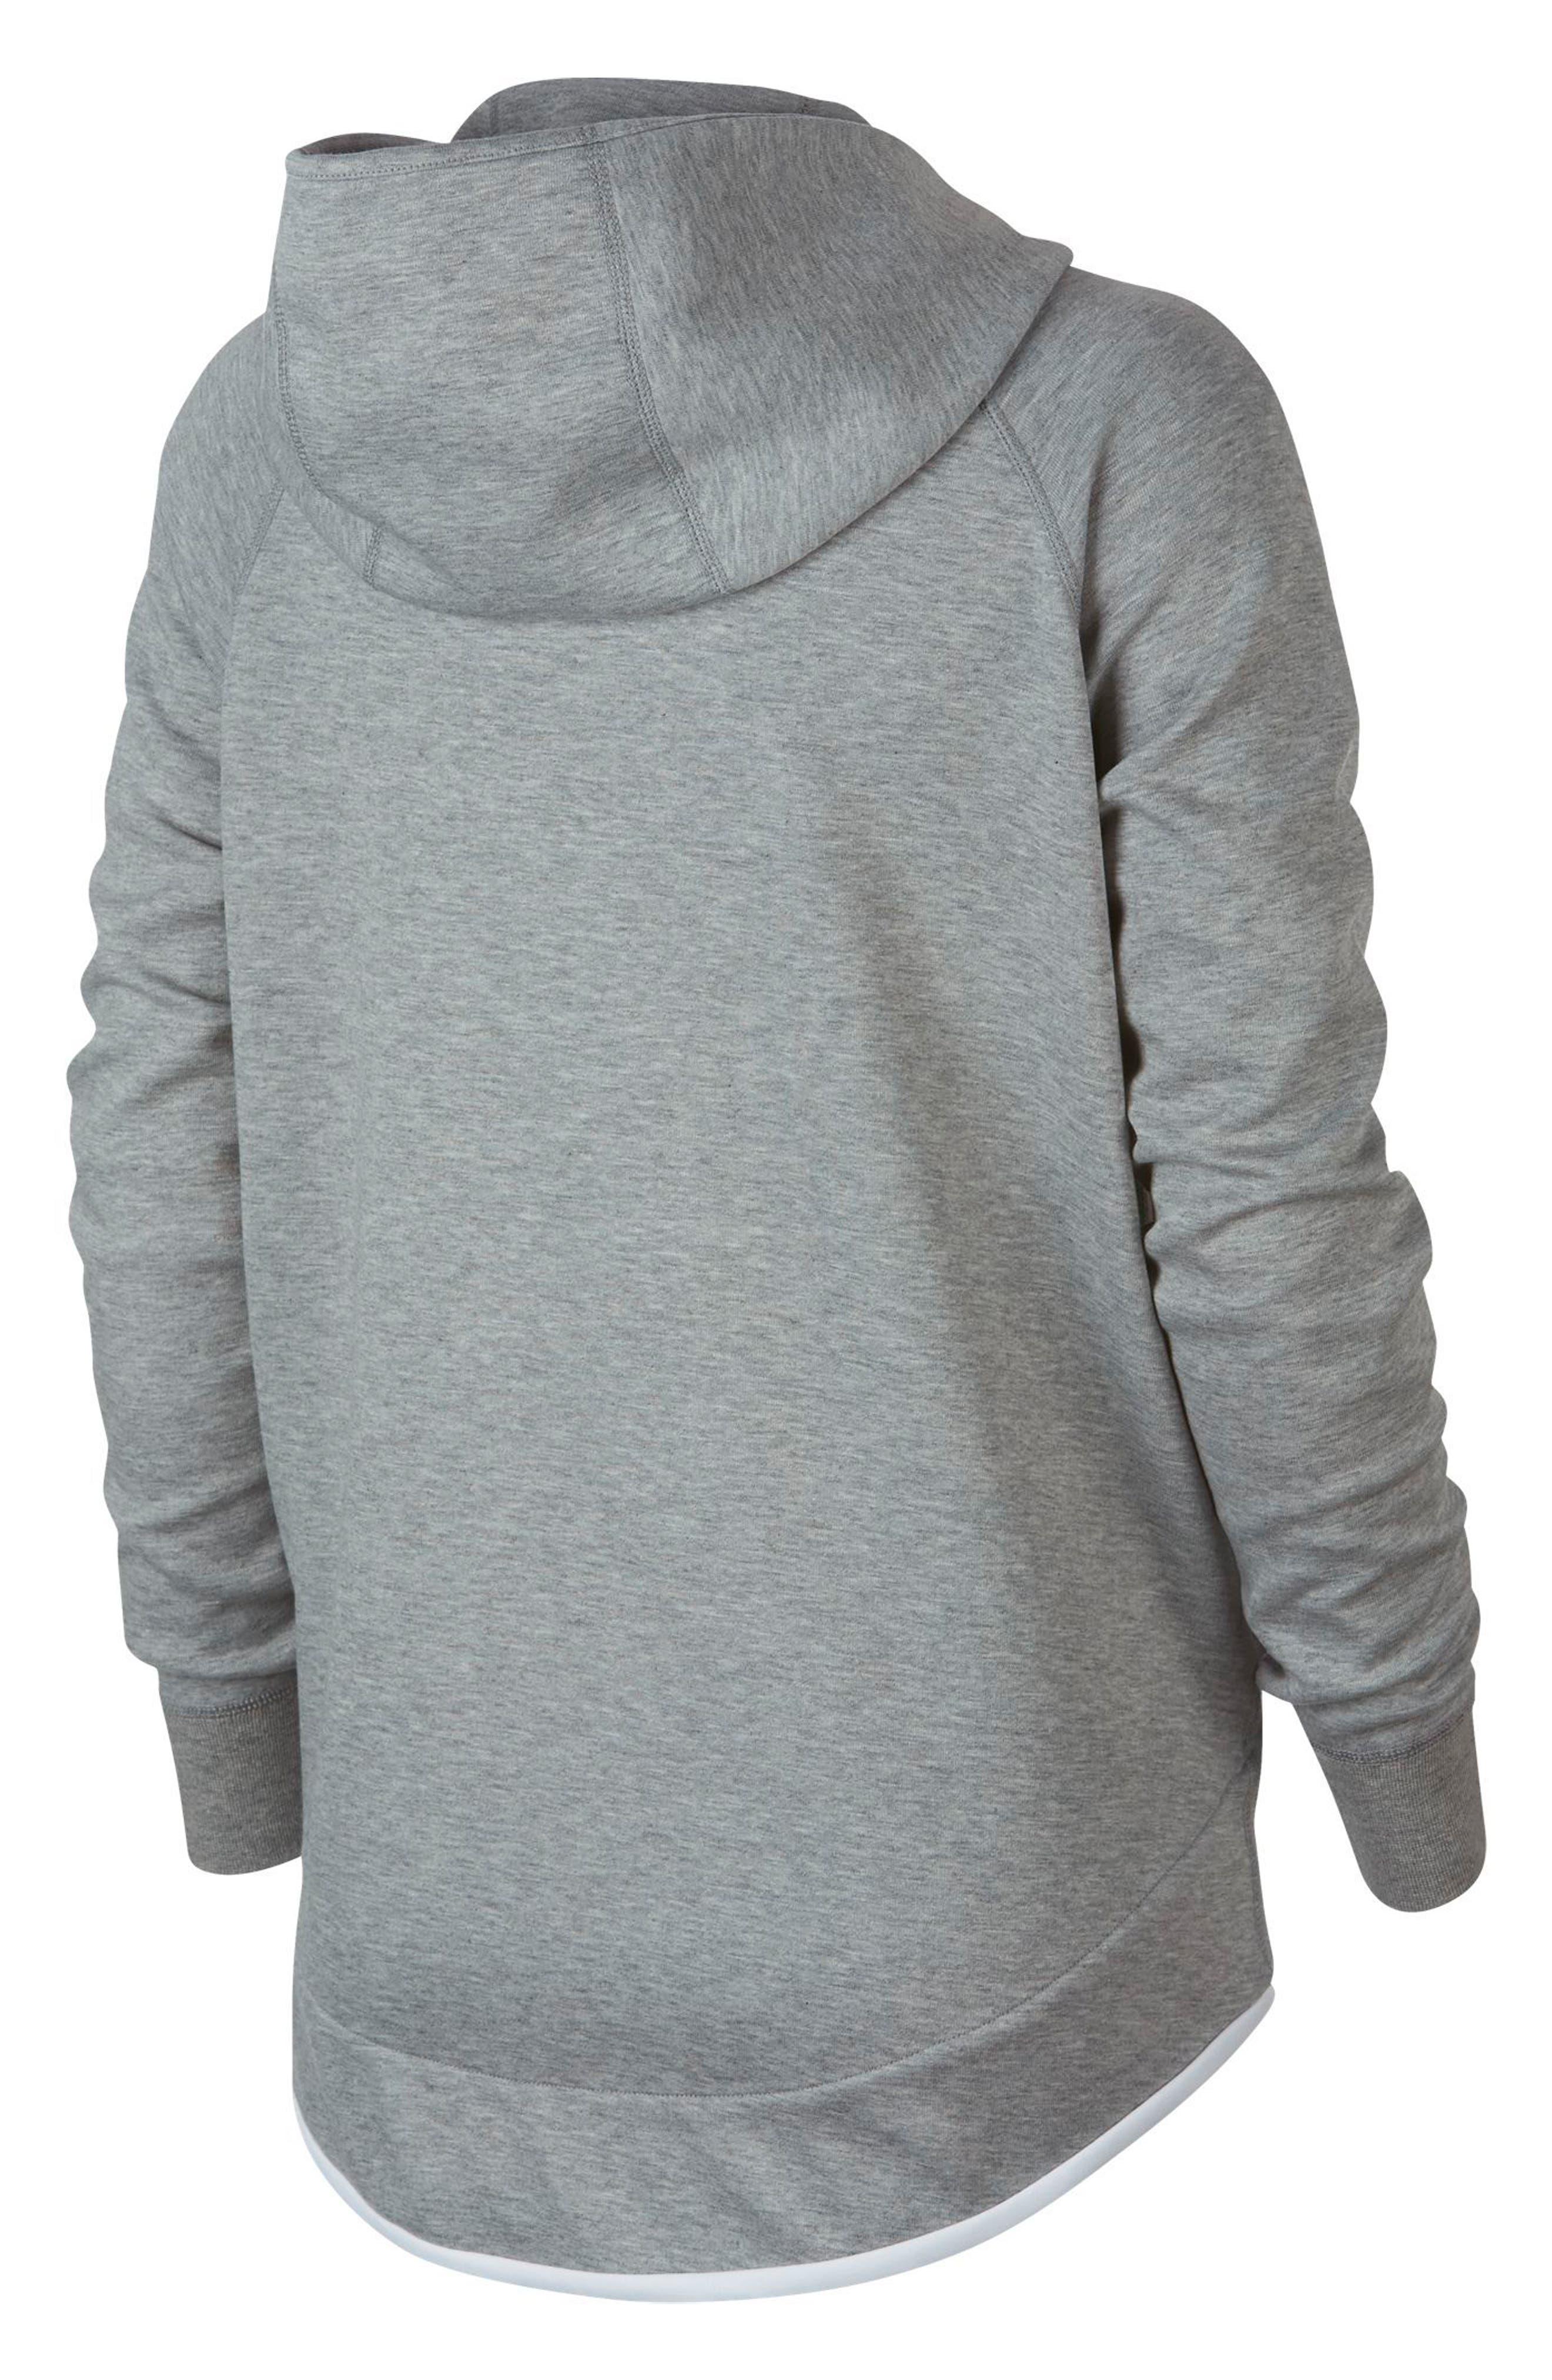 Sportswear Tech Fleece Cape Jacket,                             Alternate thumbnail 8, color,                             DARK GREY HEATHER/ WHITE